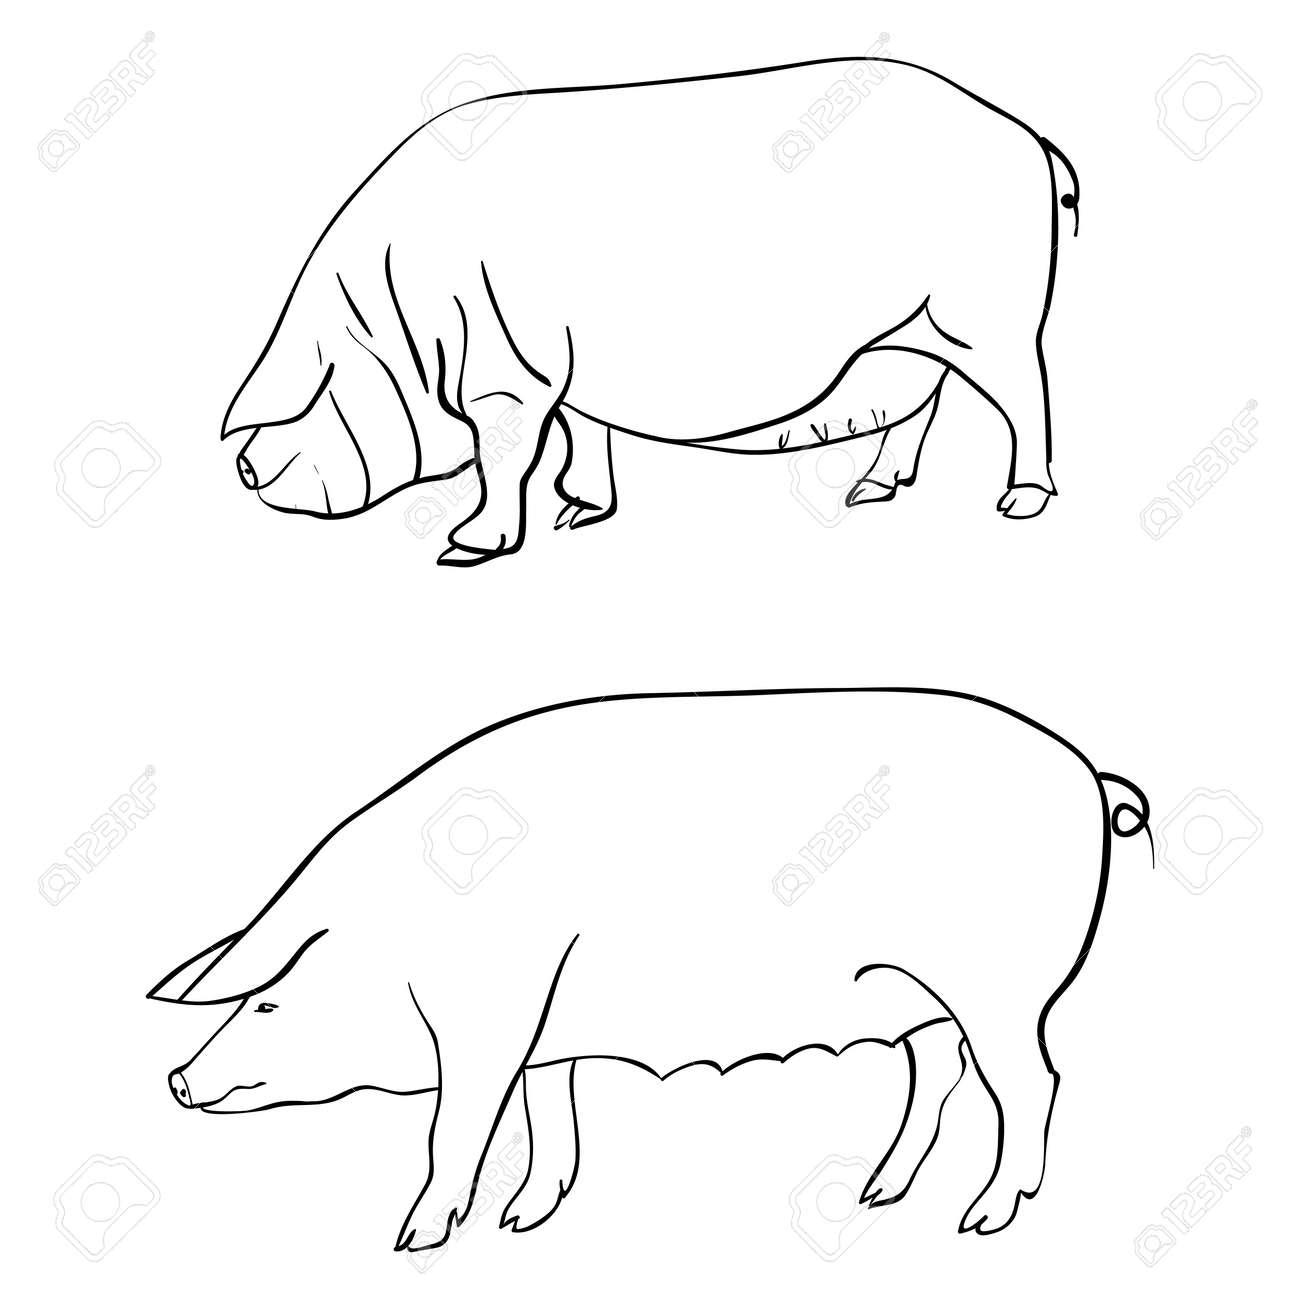 Pen drawing depicting a pig stock vector 10908213